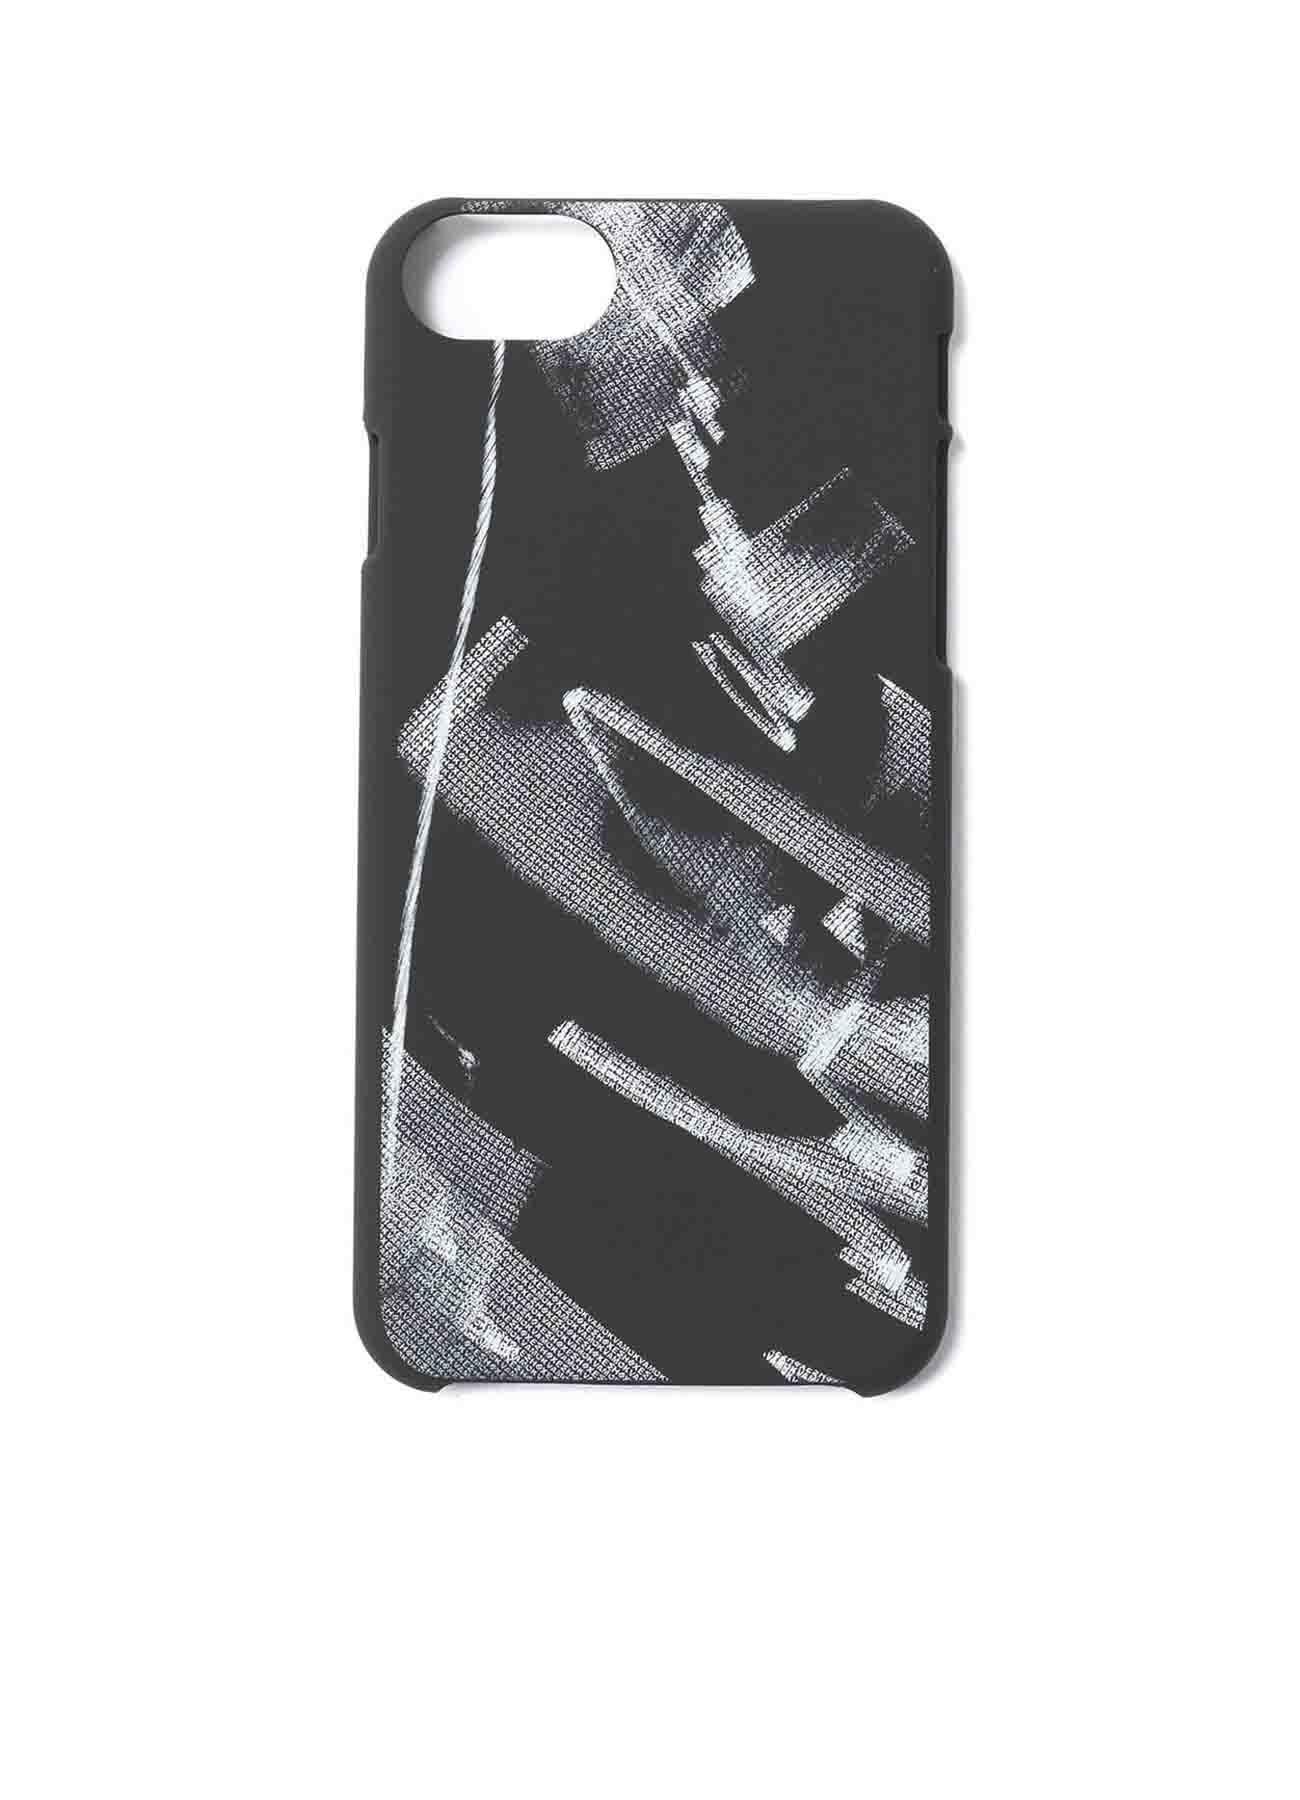 iPhone8手机壳Korokoro绘图